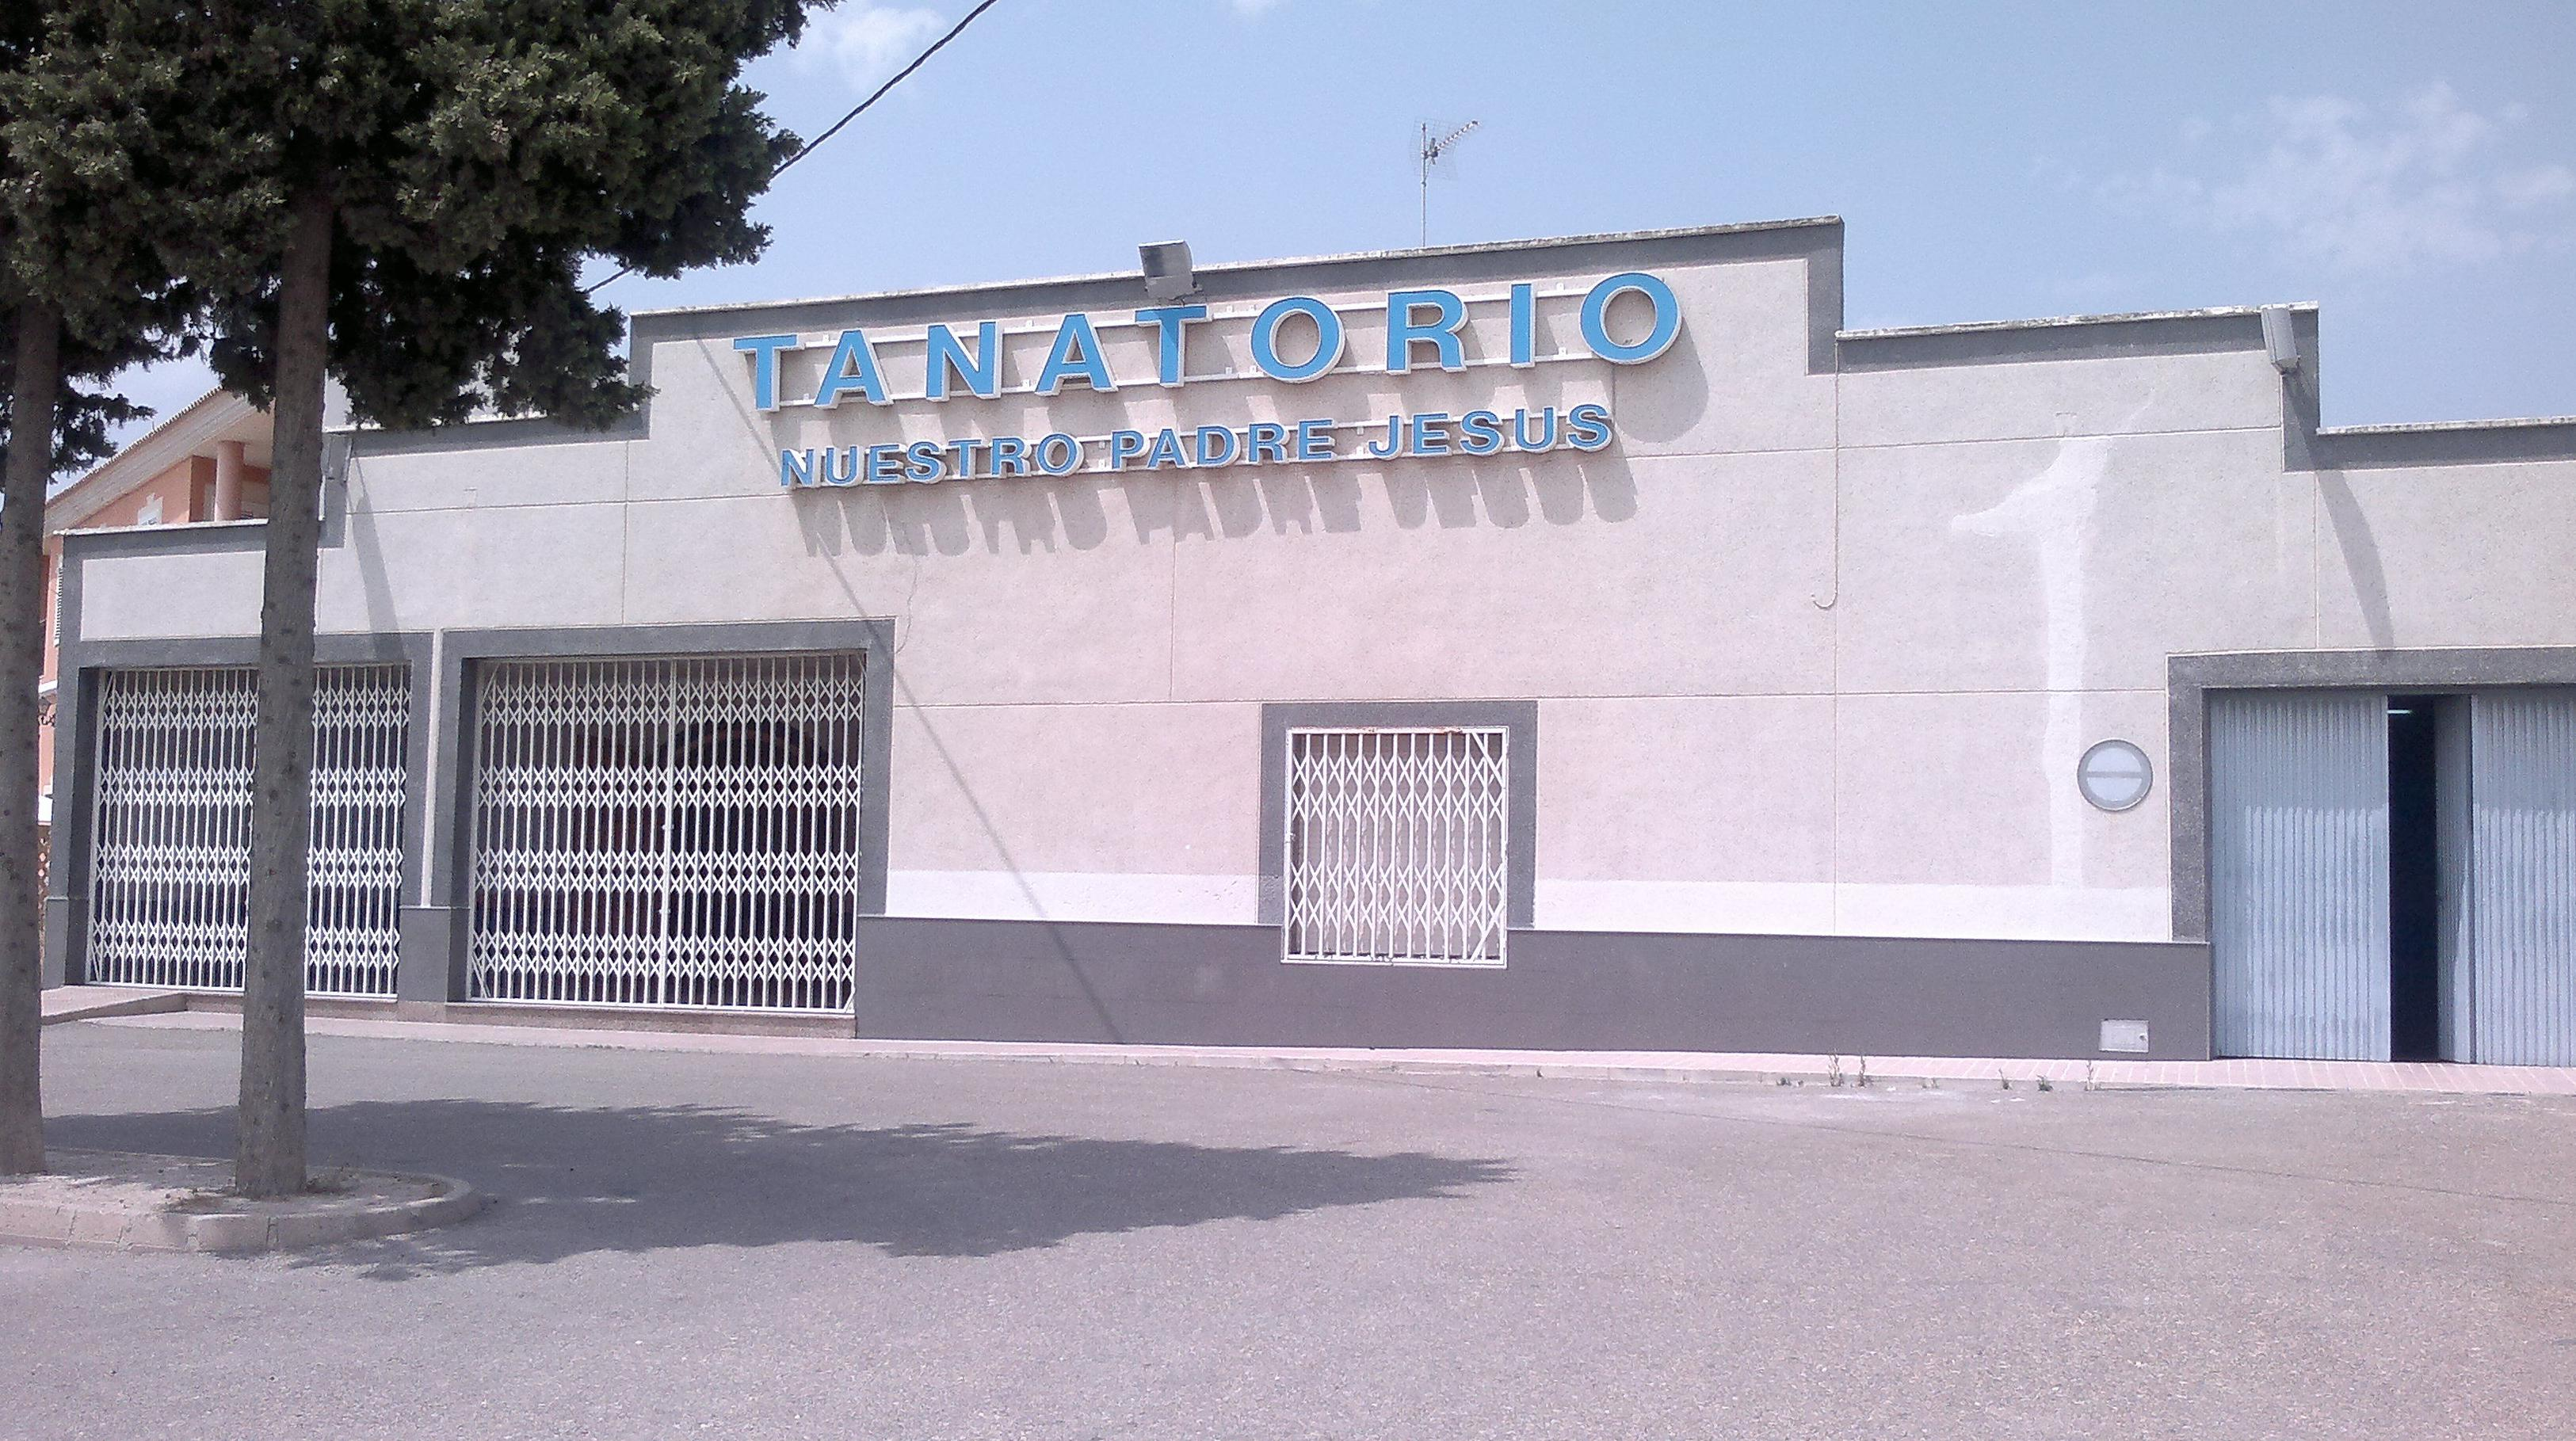 Foto 3 de Funerarias en Mula | Funeraria Tanatorio Santo Domingo, S.L.